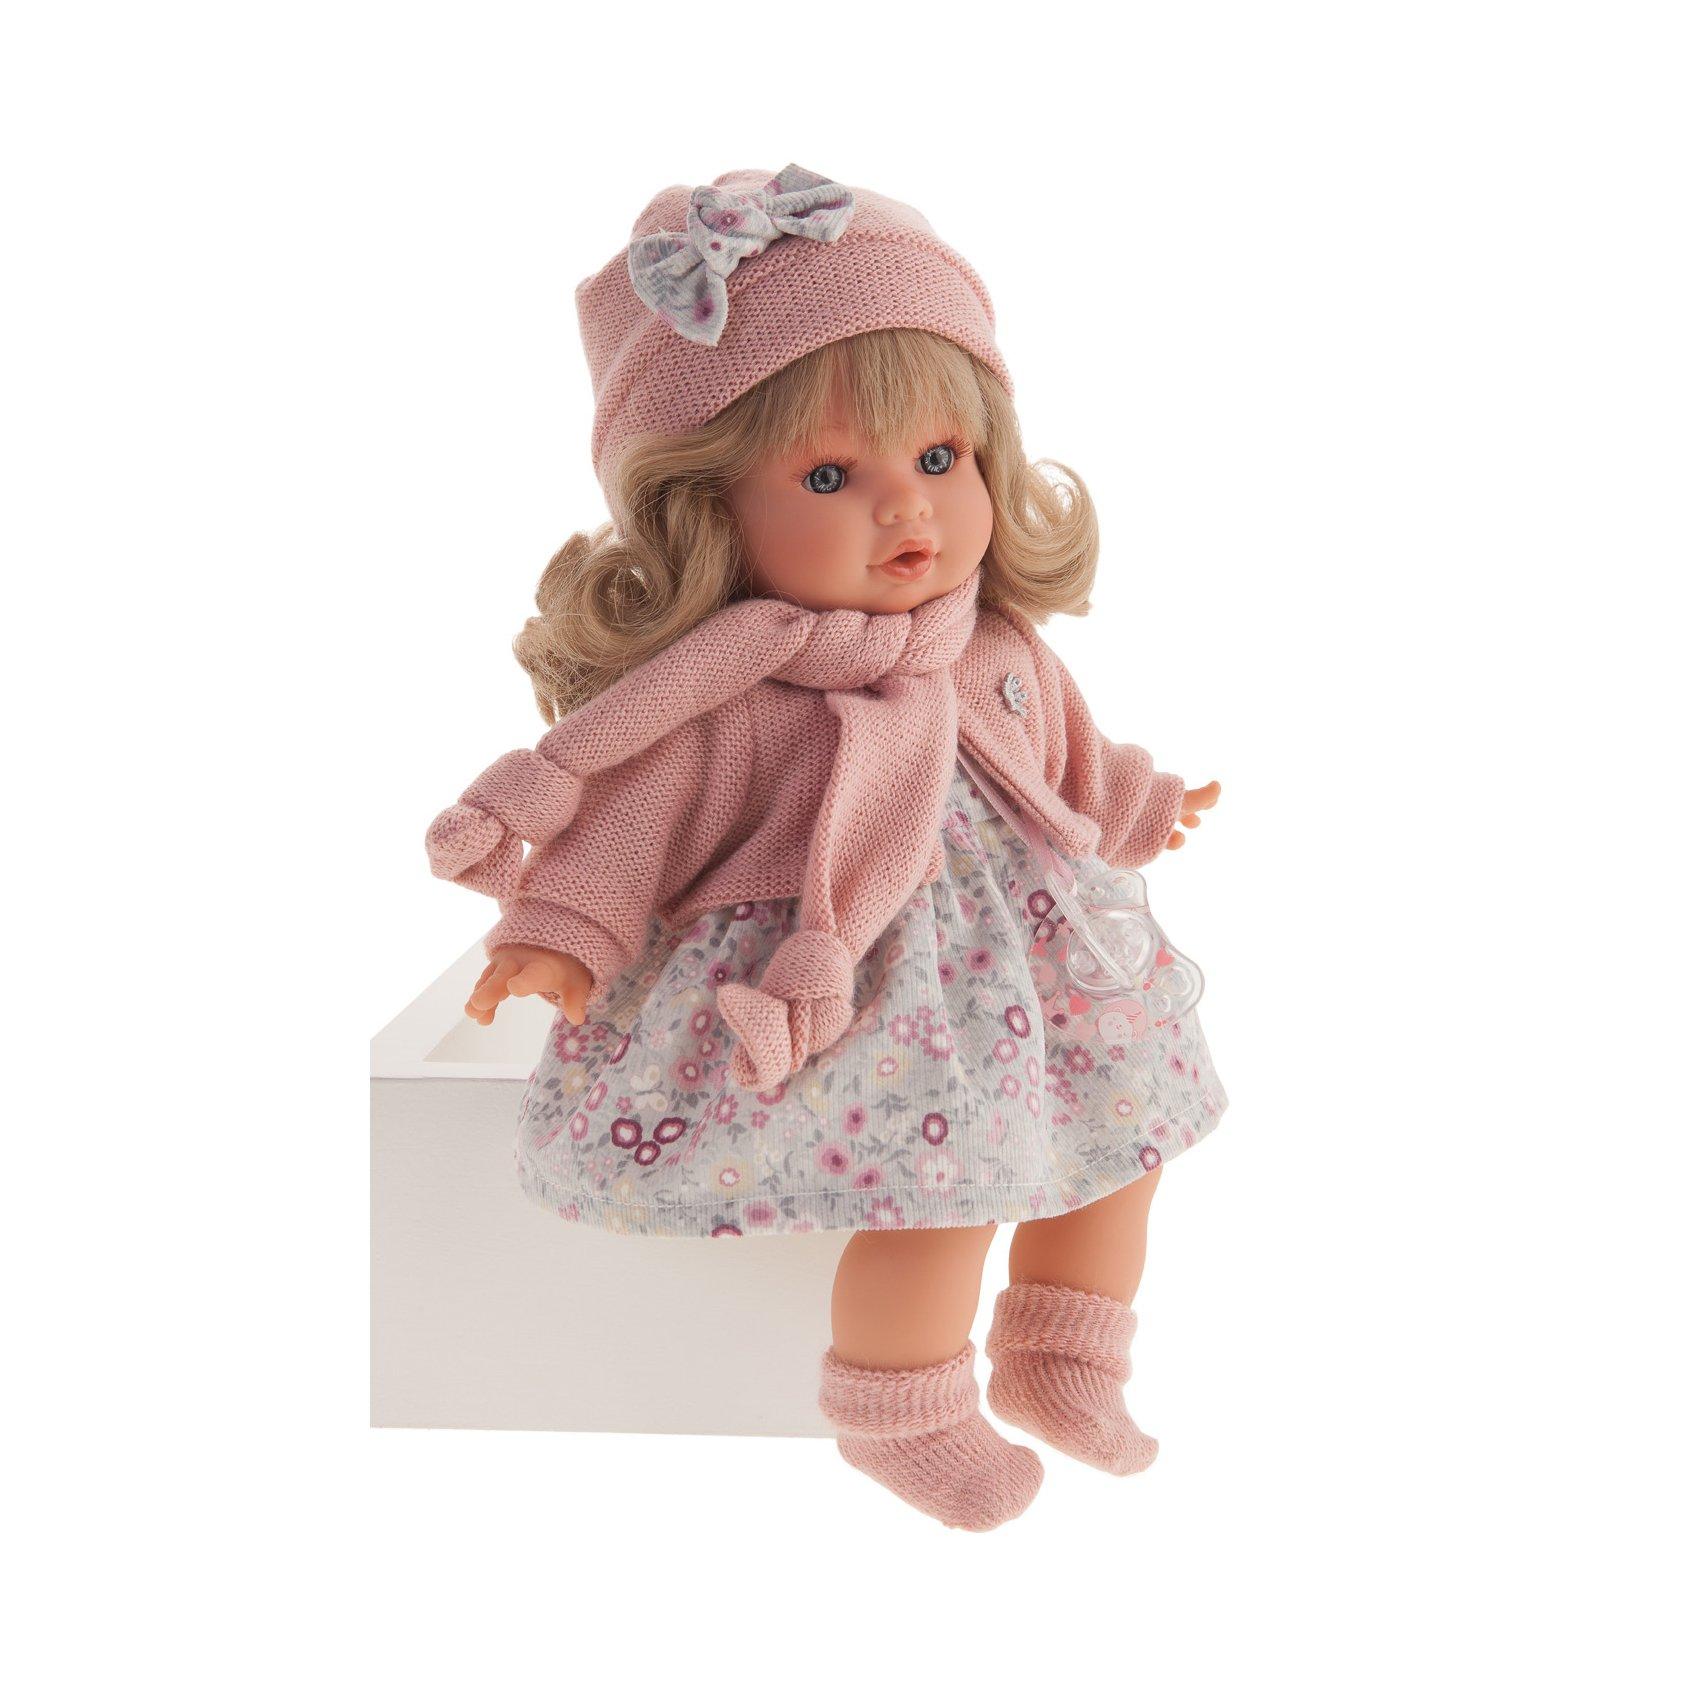 Papusa fetita Dato Melenita blonda cu rochita roz si accesorii crosetate, cu sunet, Antonio Juan